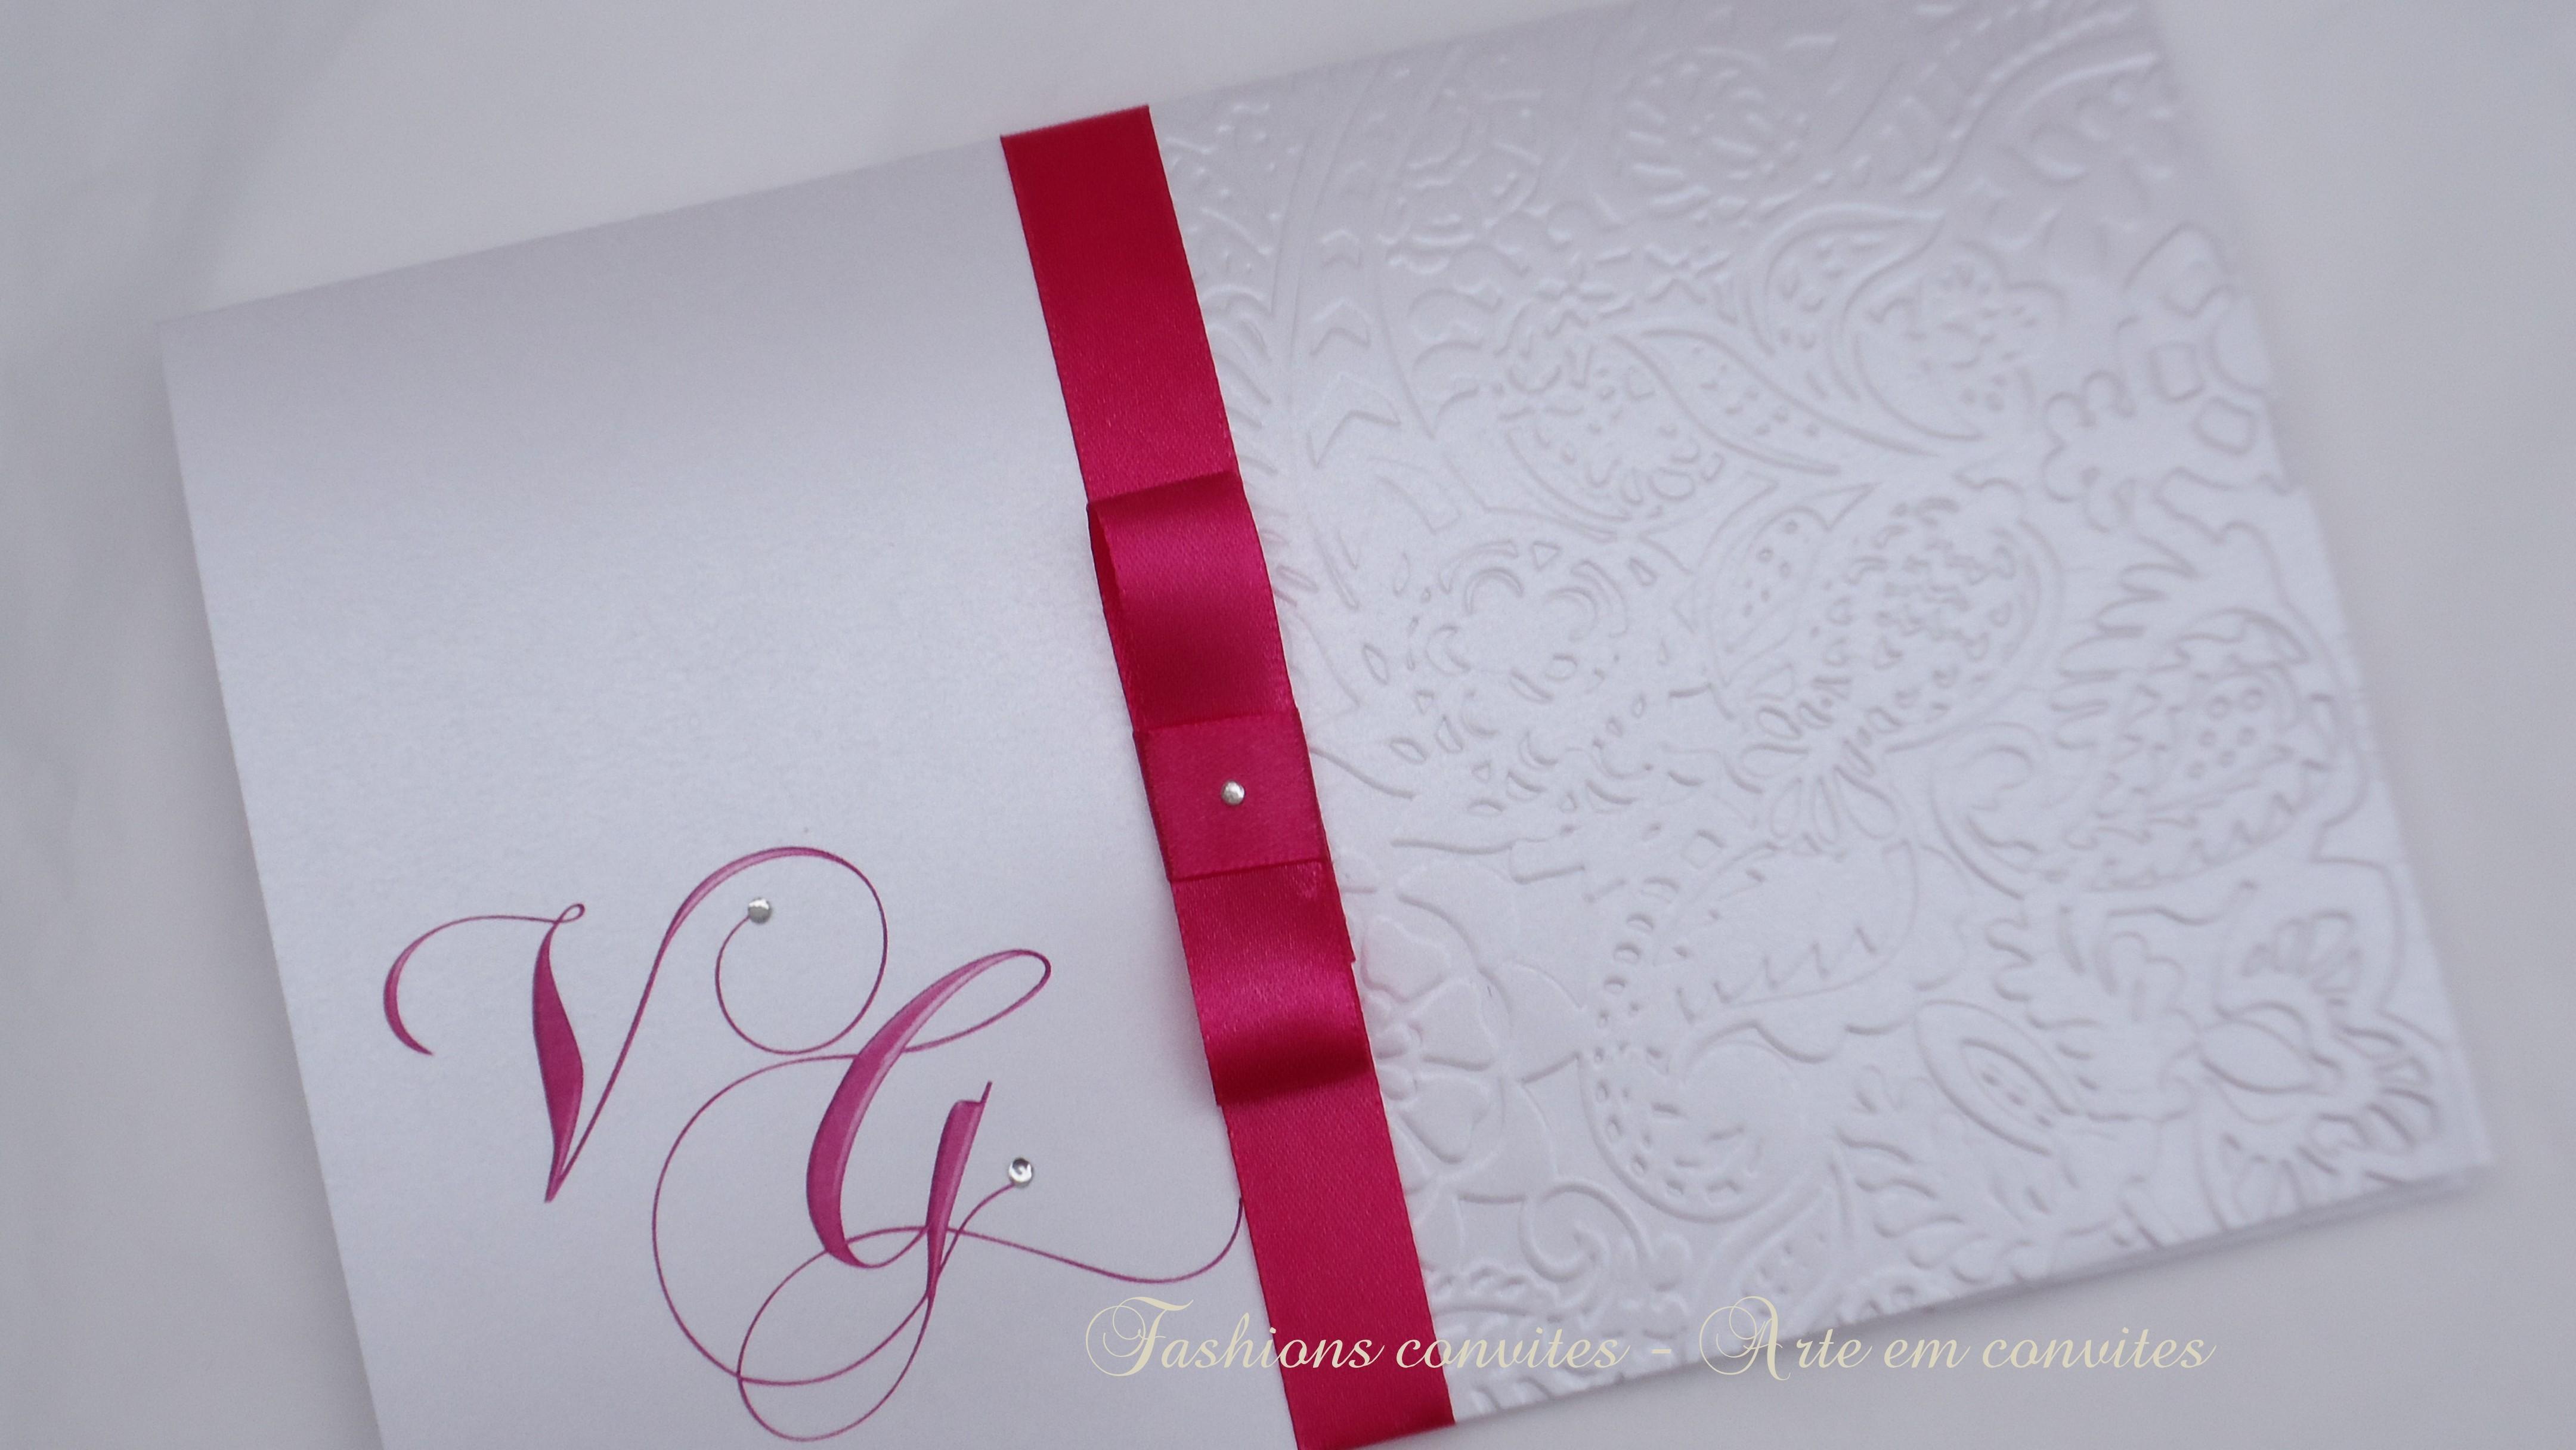 Fashions convites Convites de casamento Fashions convites Convites ...